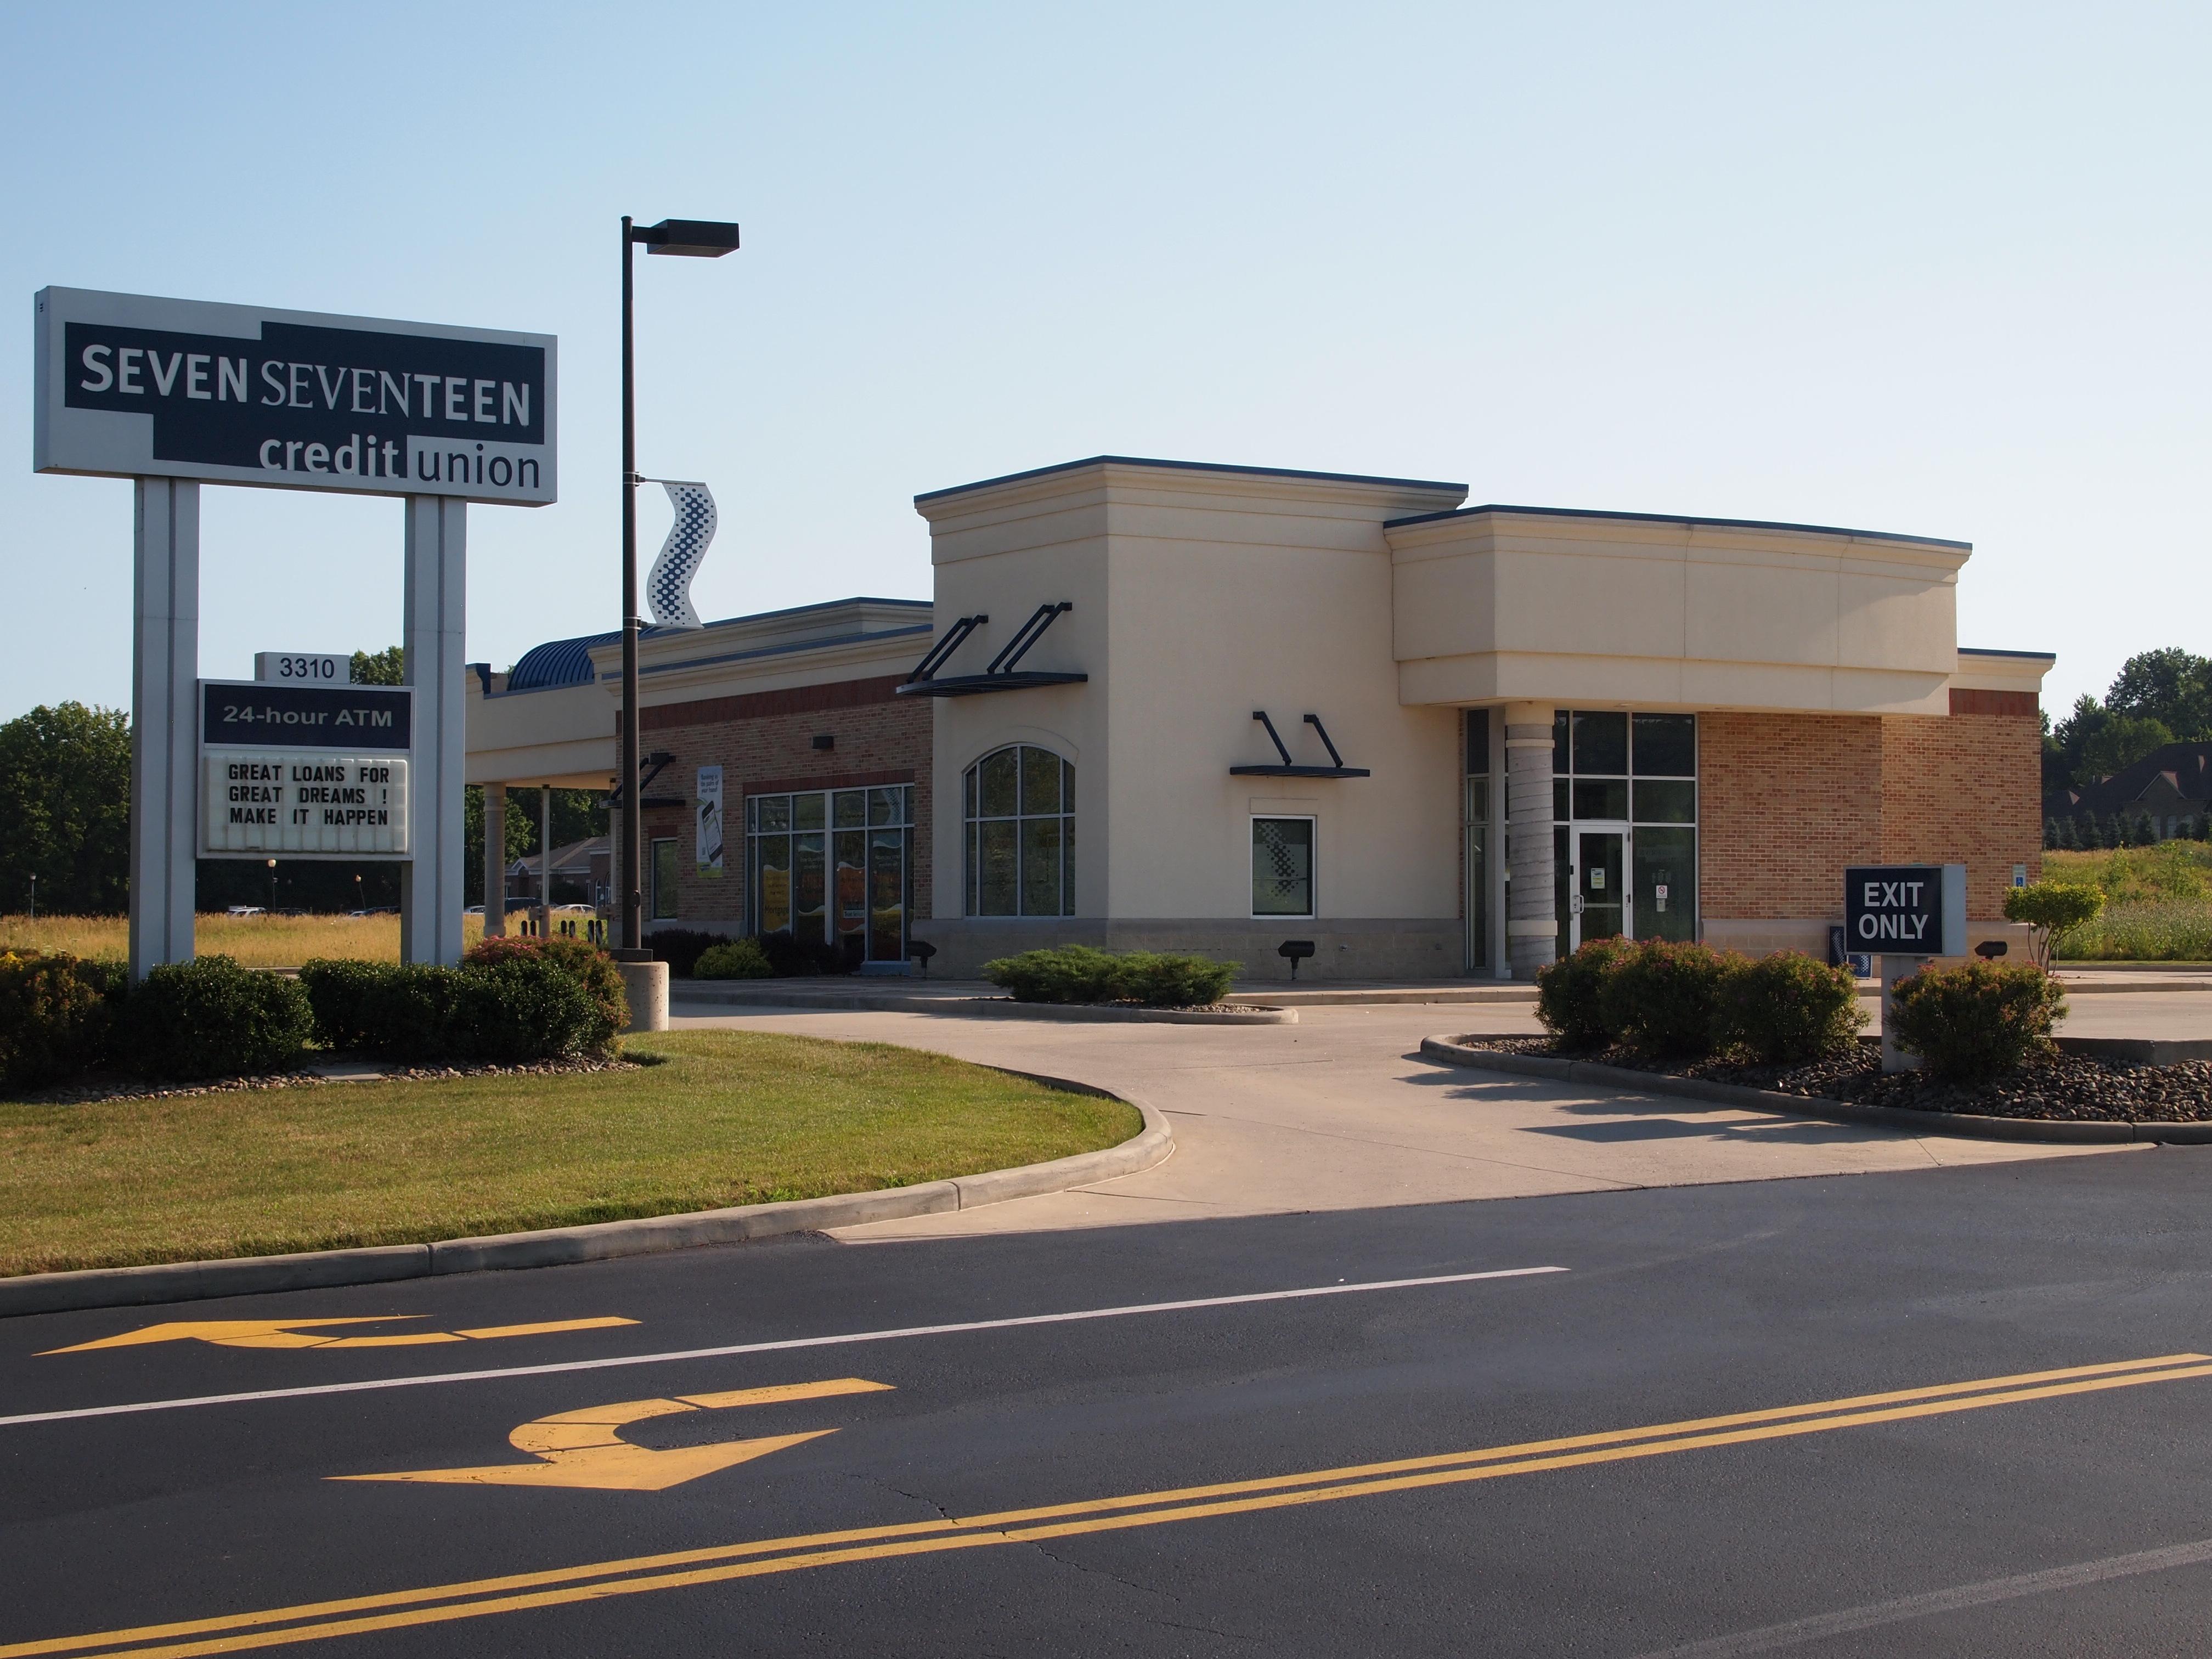 7 17 Credit Union - Cortland Office image 0